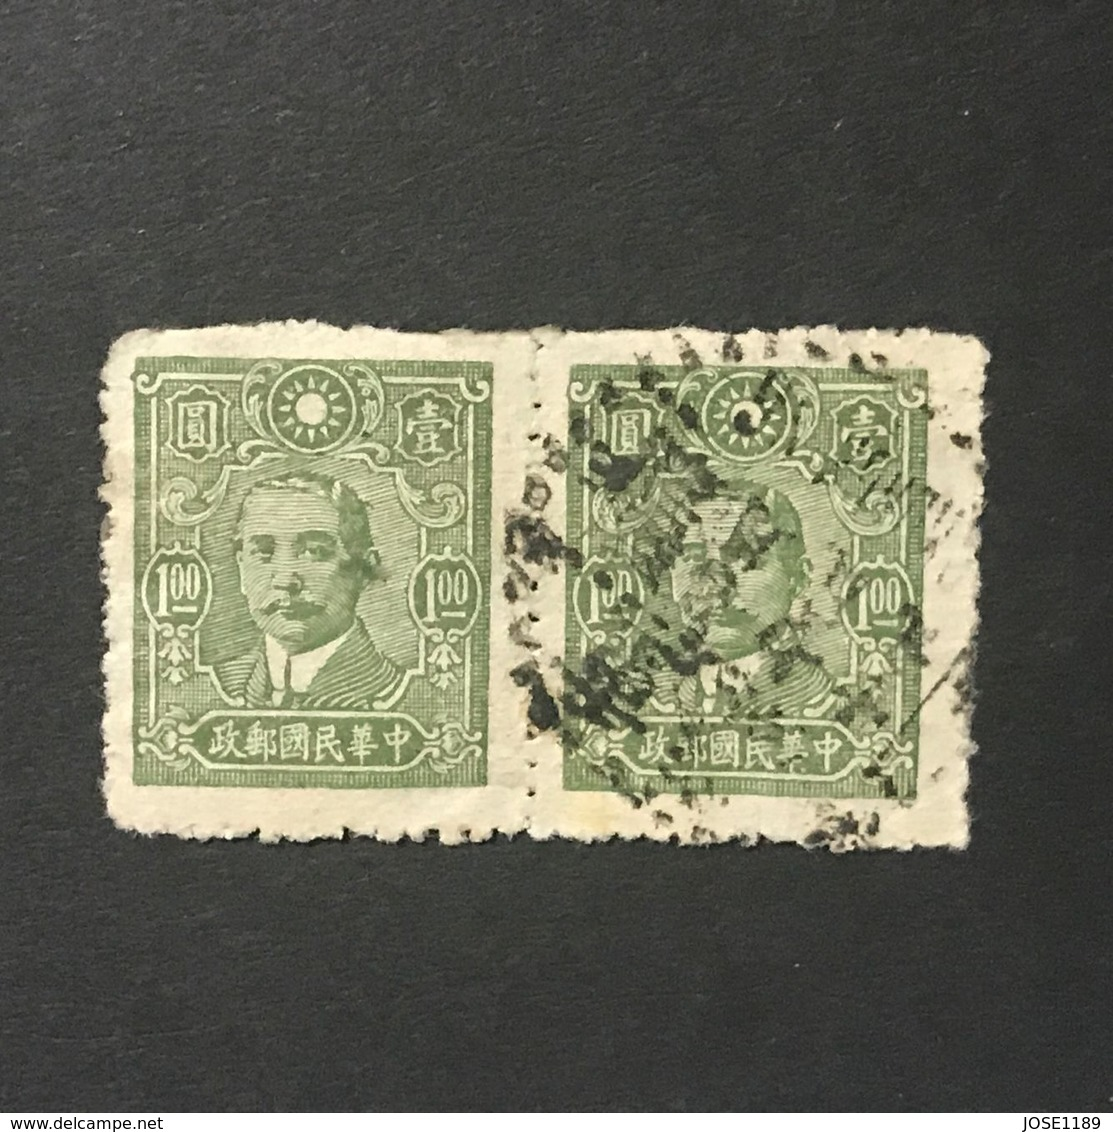 ◆◆◆CHINA 1942-44 Dr . Sun Yat-Sen  Issue Central Trust Print   $1  X2  Green    USED  AA2517 - 1912-1949 République